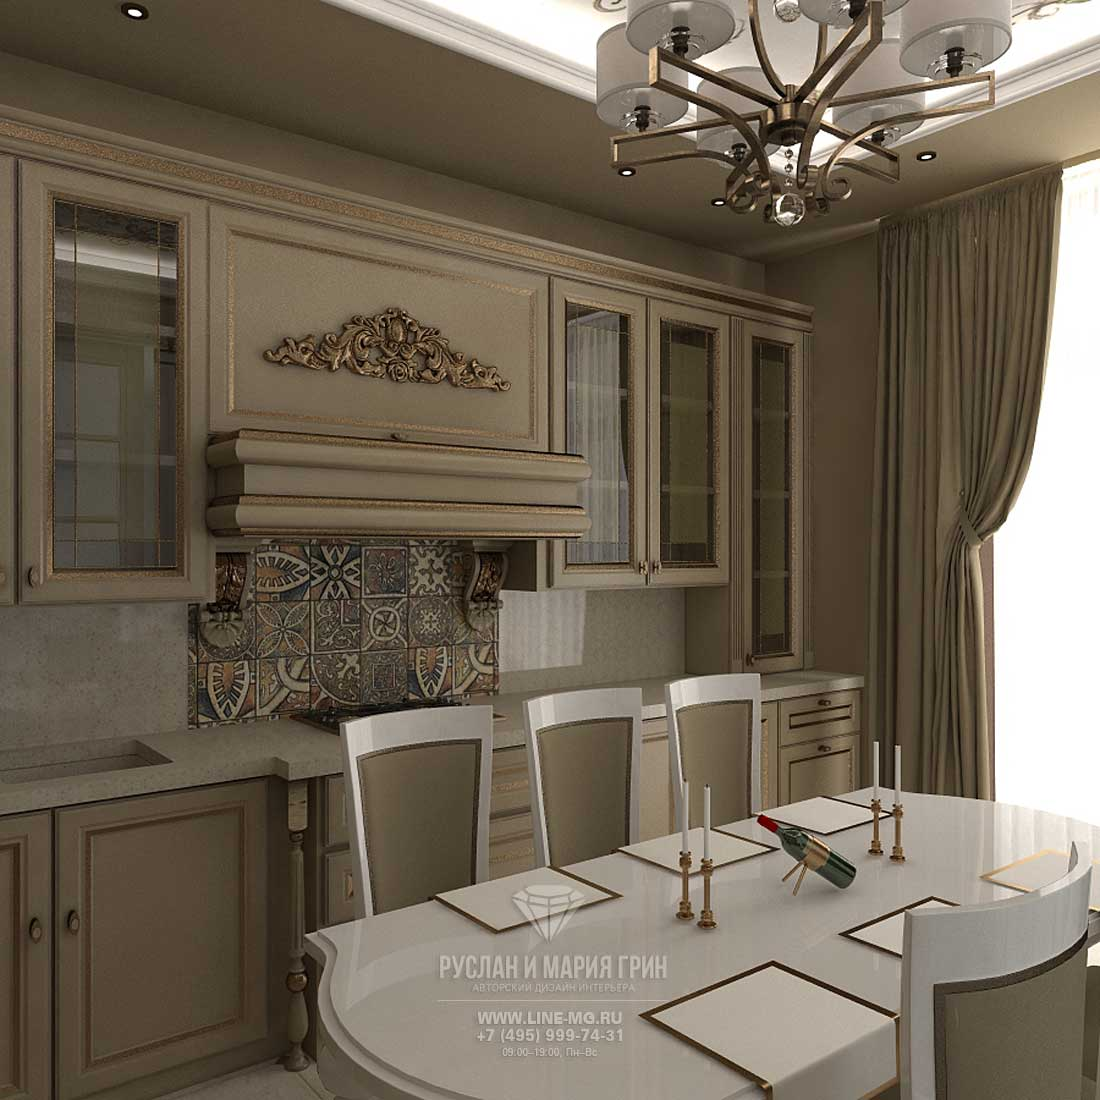 Дизайн бежевой кухни в квартире